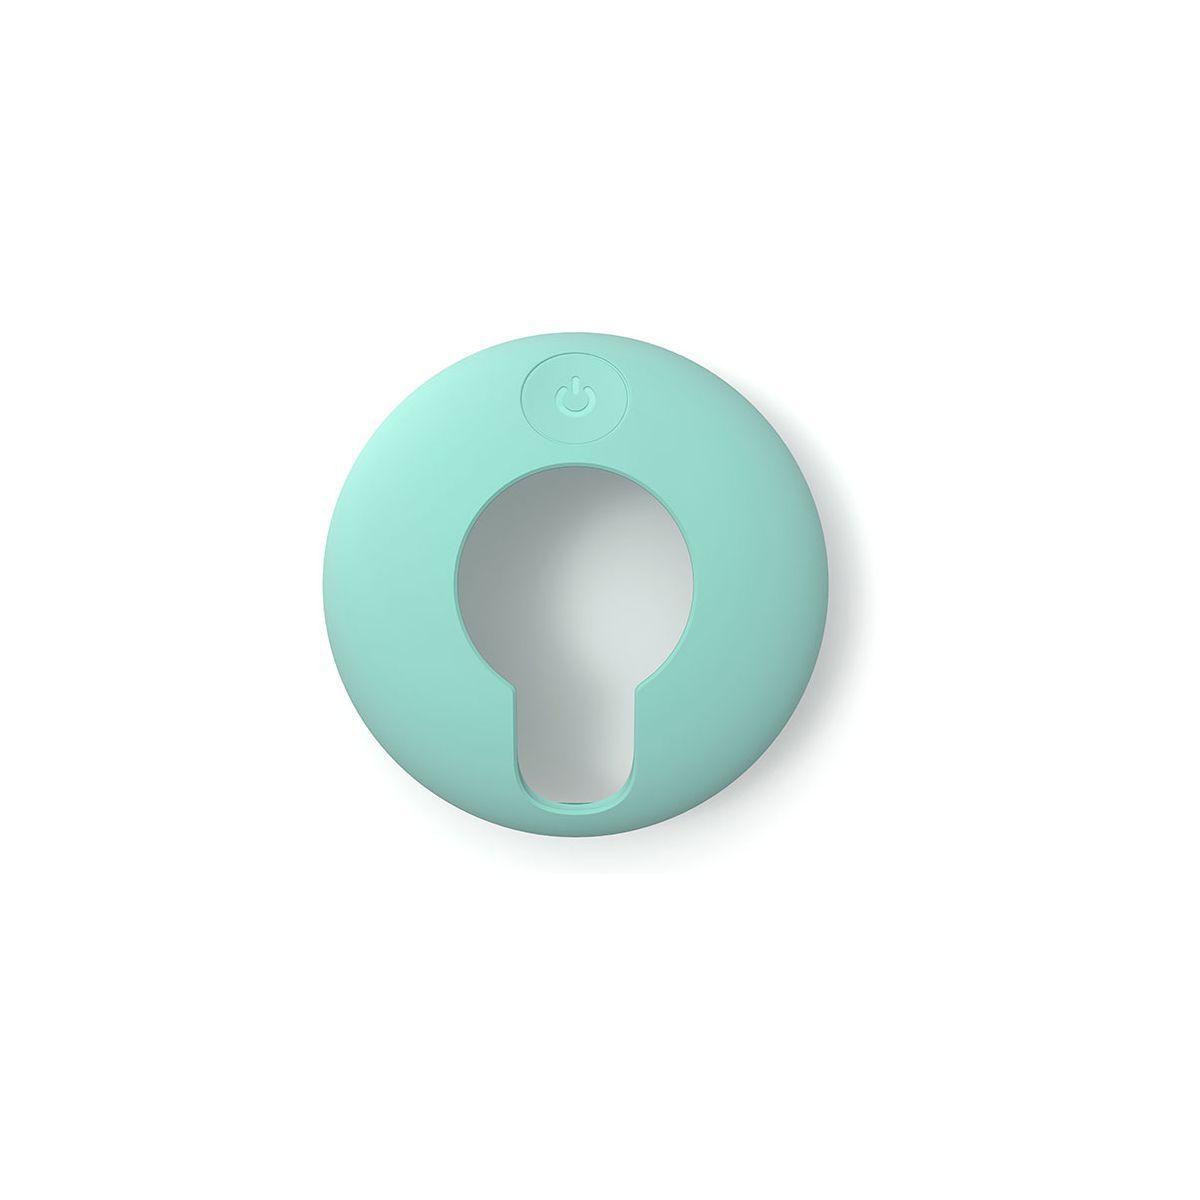 Coque TOMTOM Coque protection silicone Verte VIO